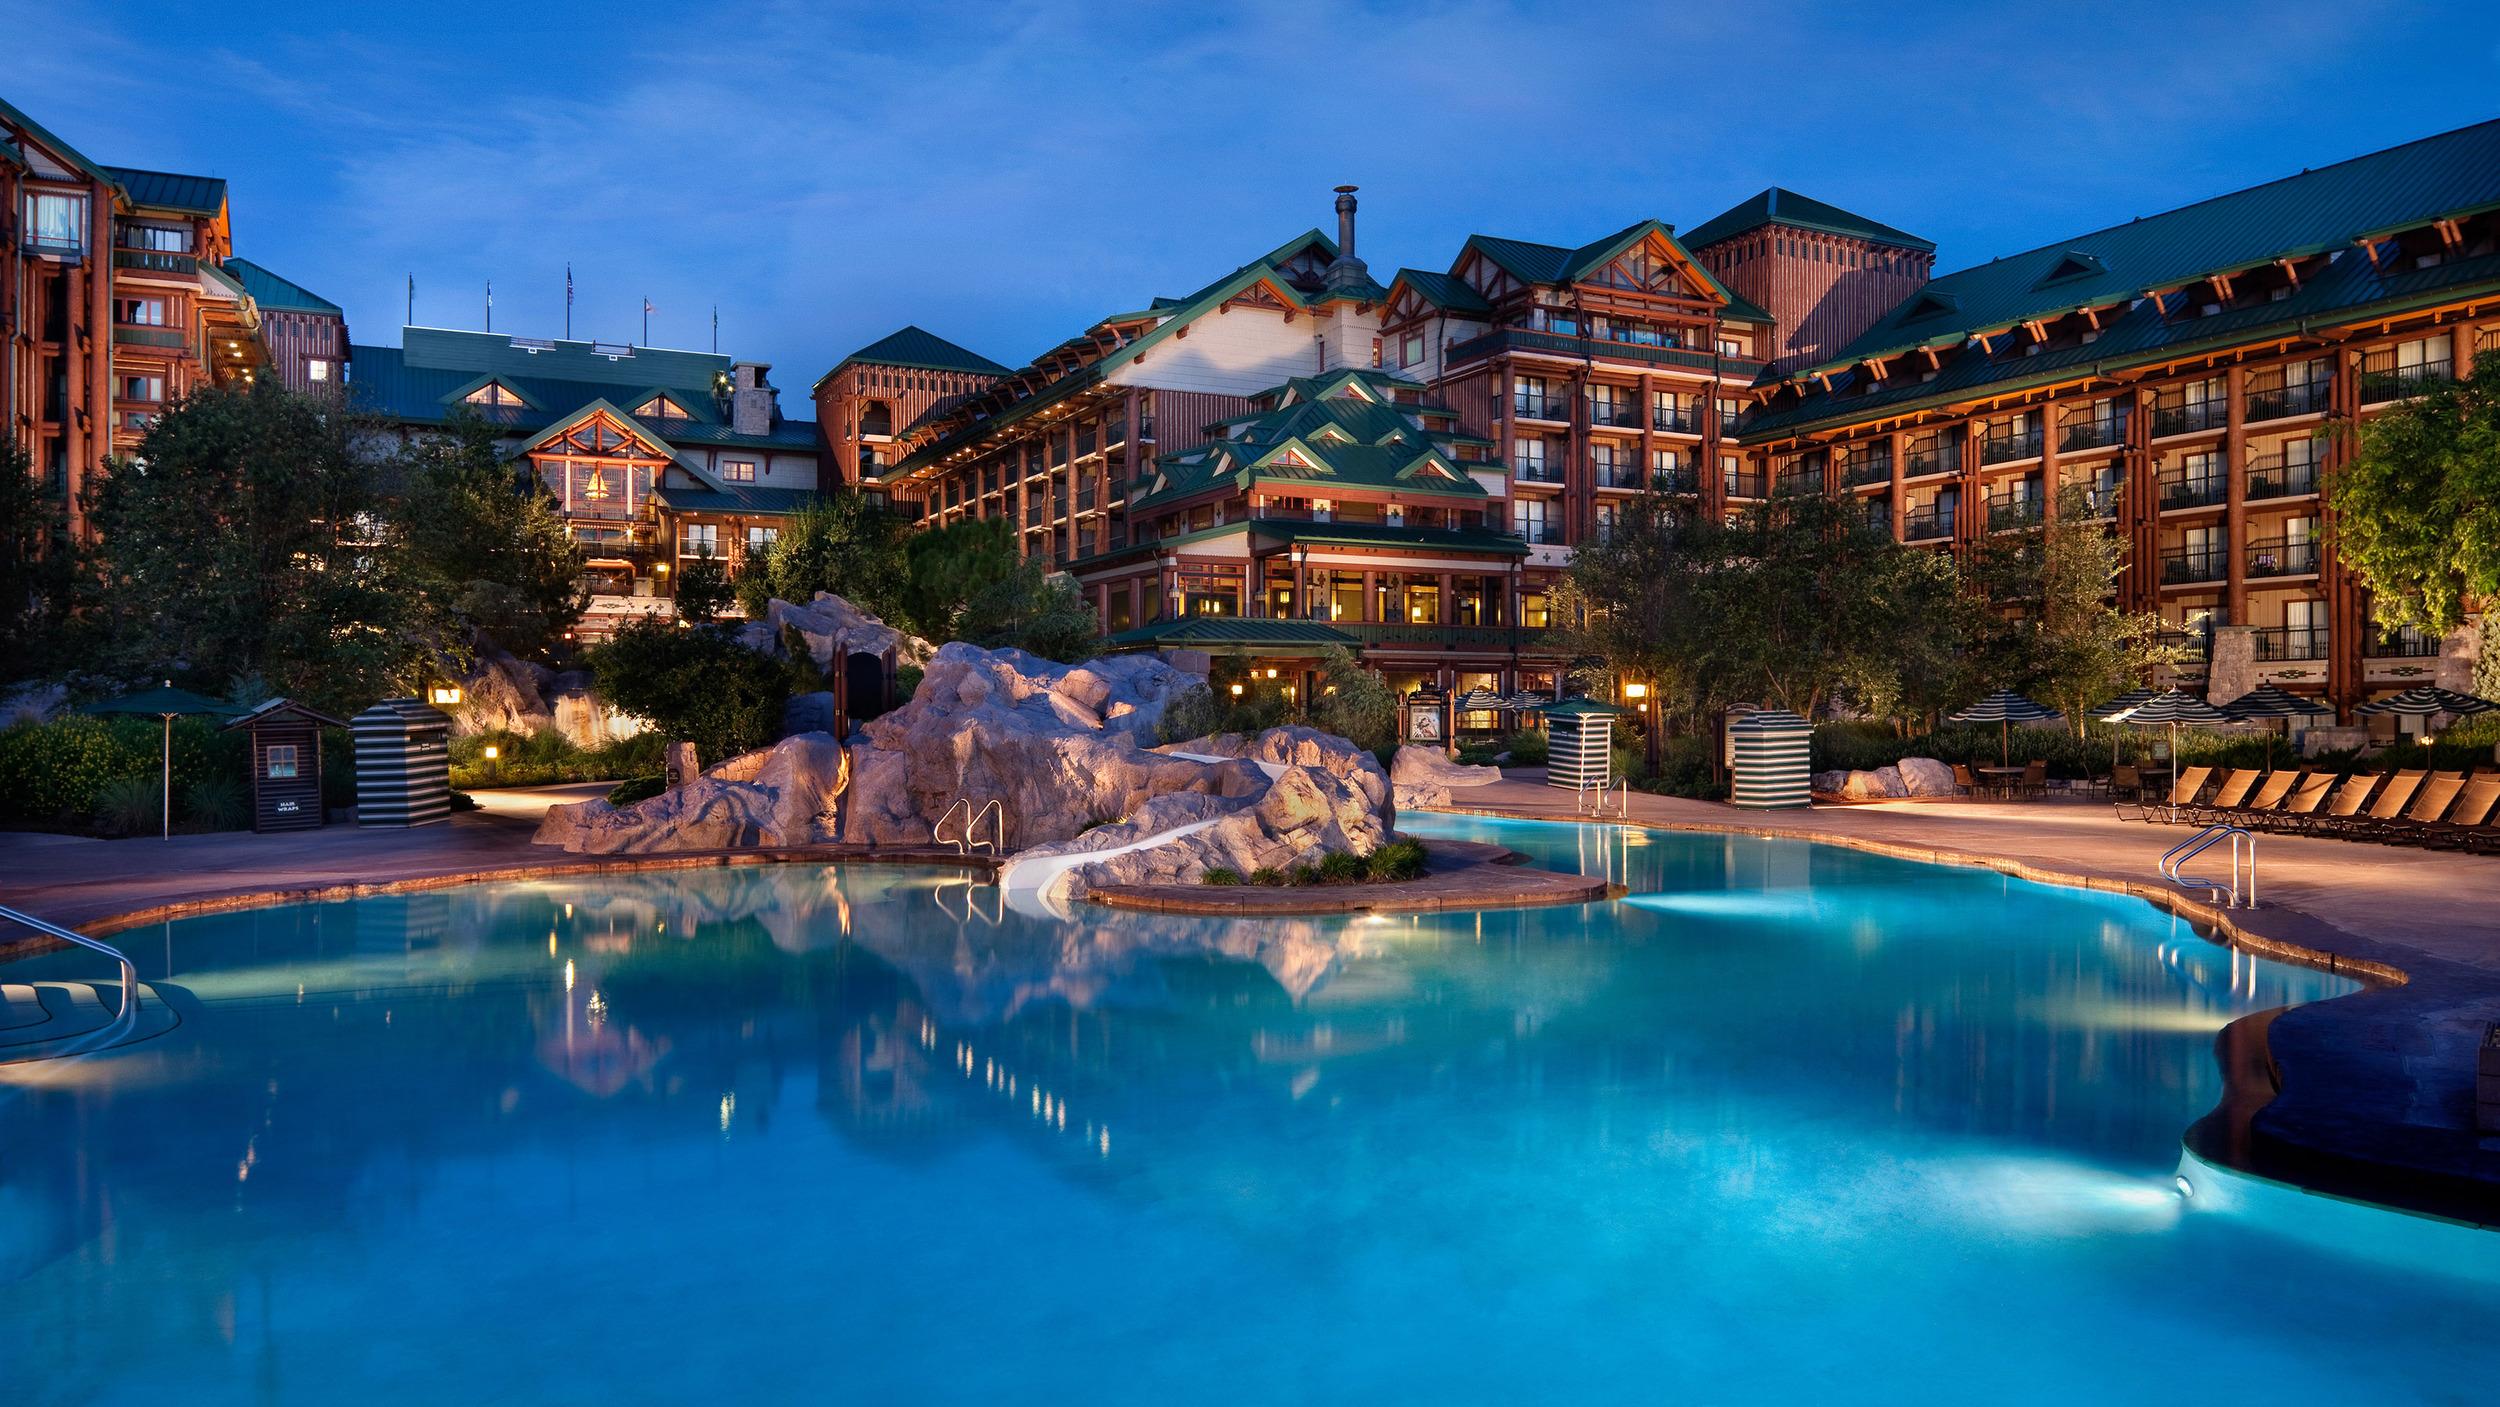 Rennovation Work begins Oct 26, 2015 at Disney's Wilderness Lodge